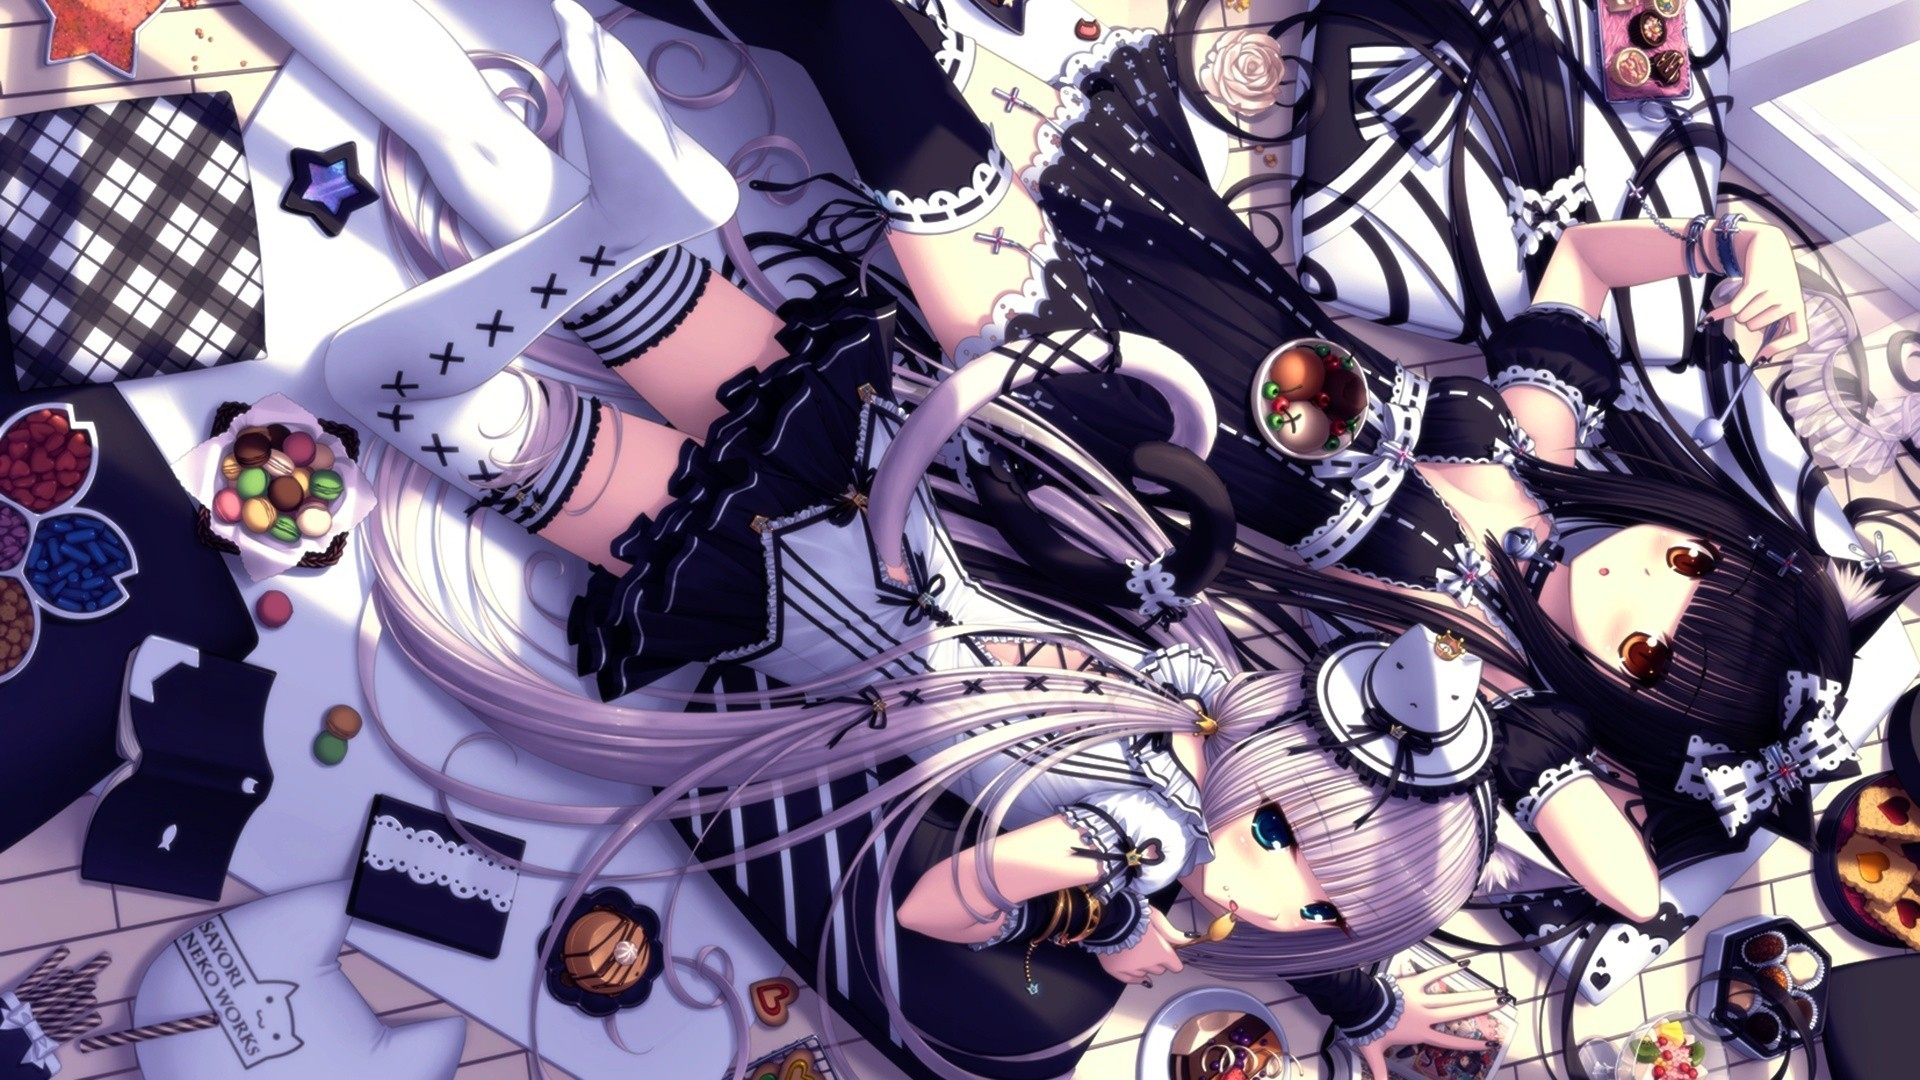 1920x1080 Sayori Neko Wallpaper Works Anime Girls